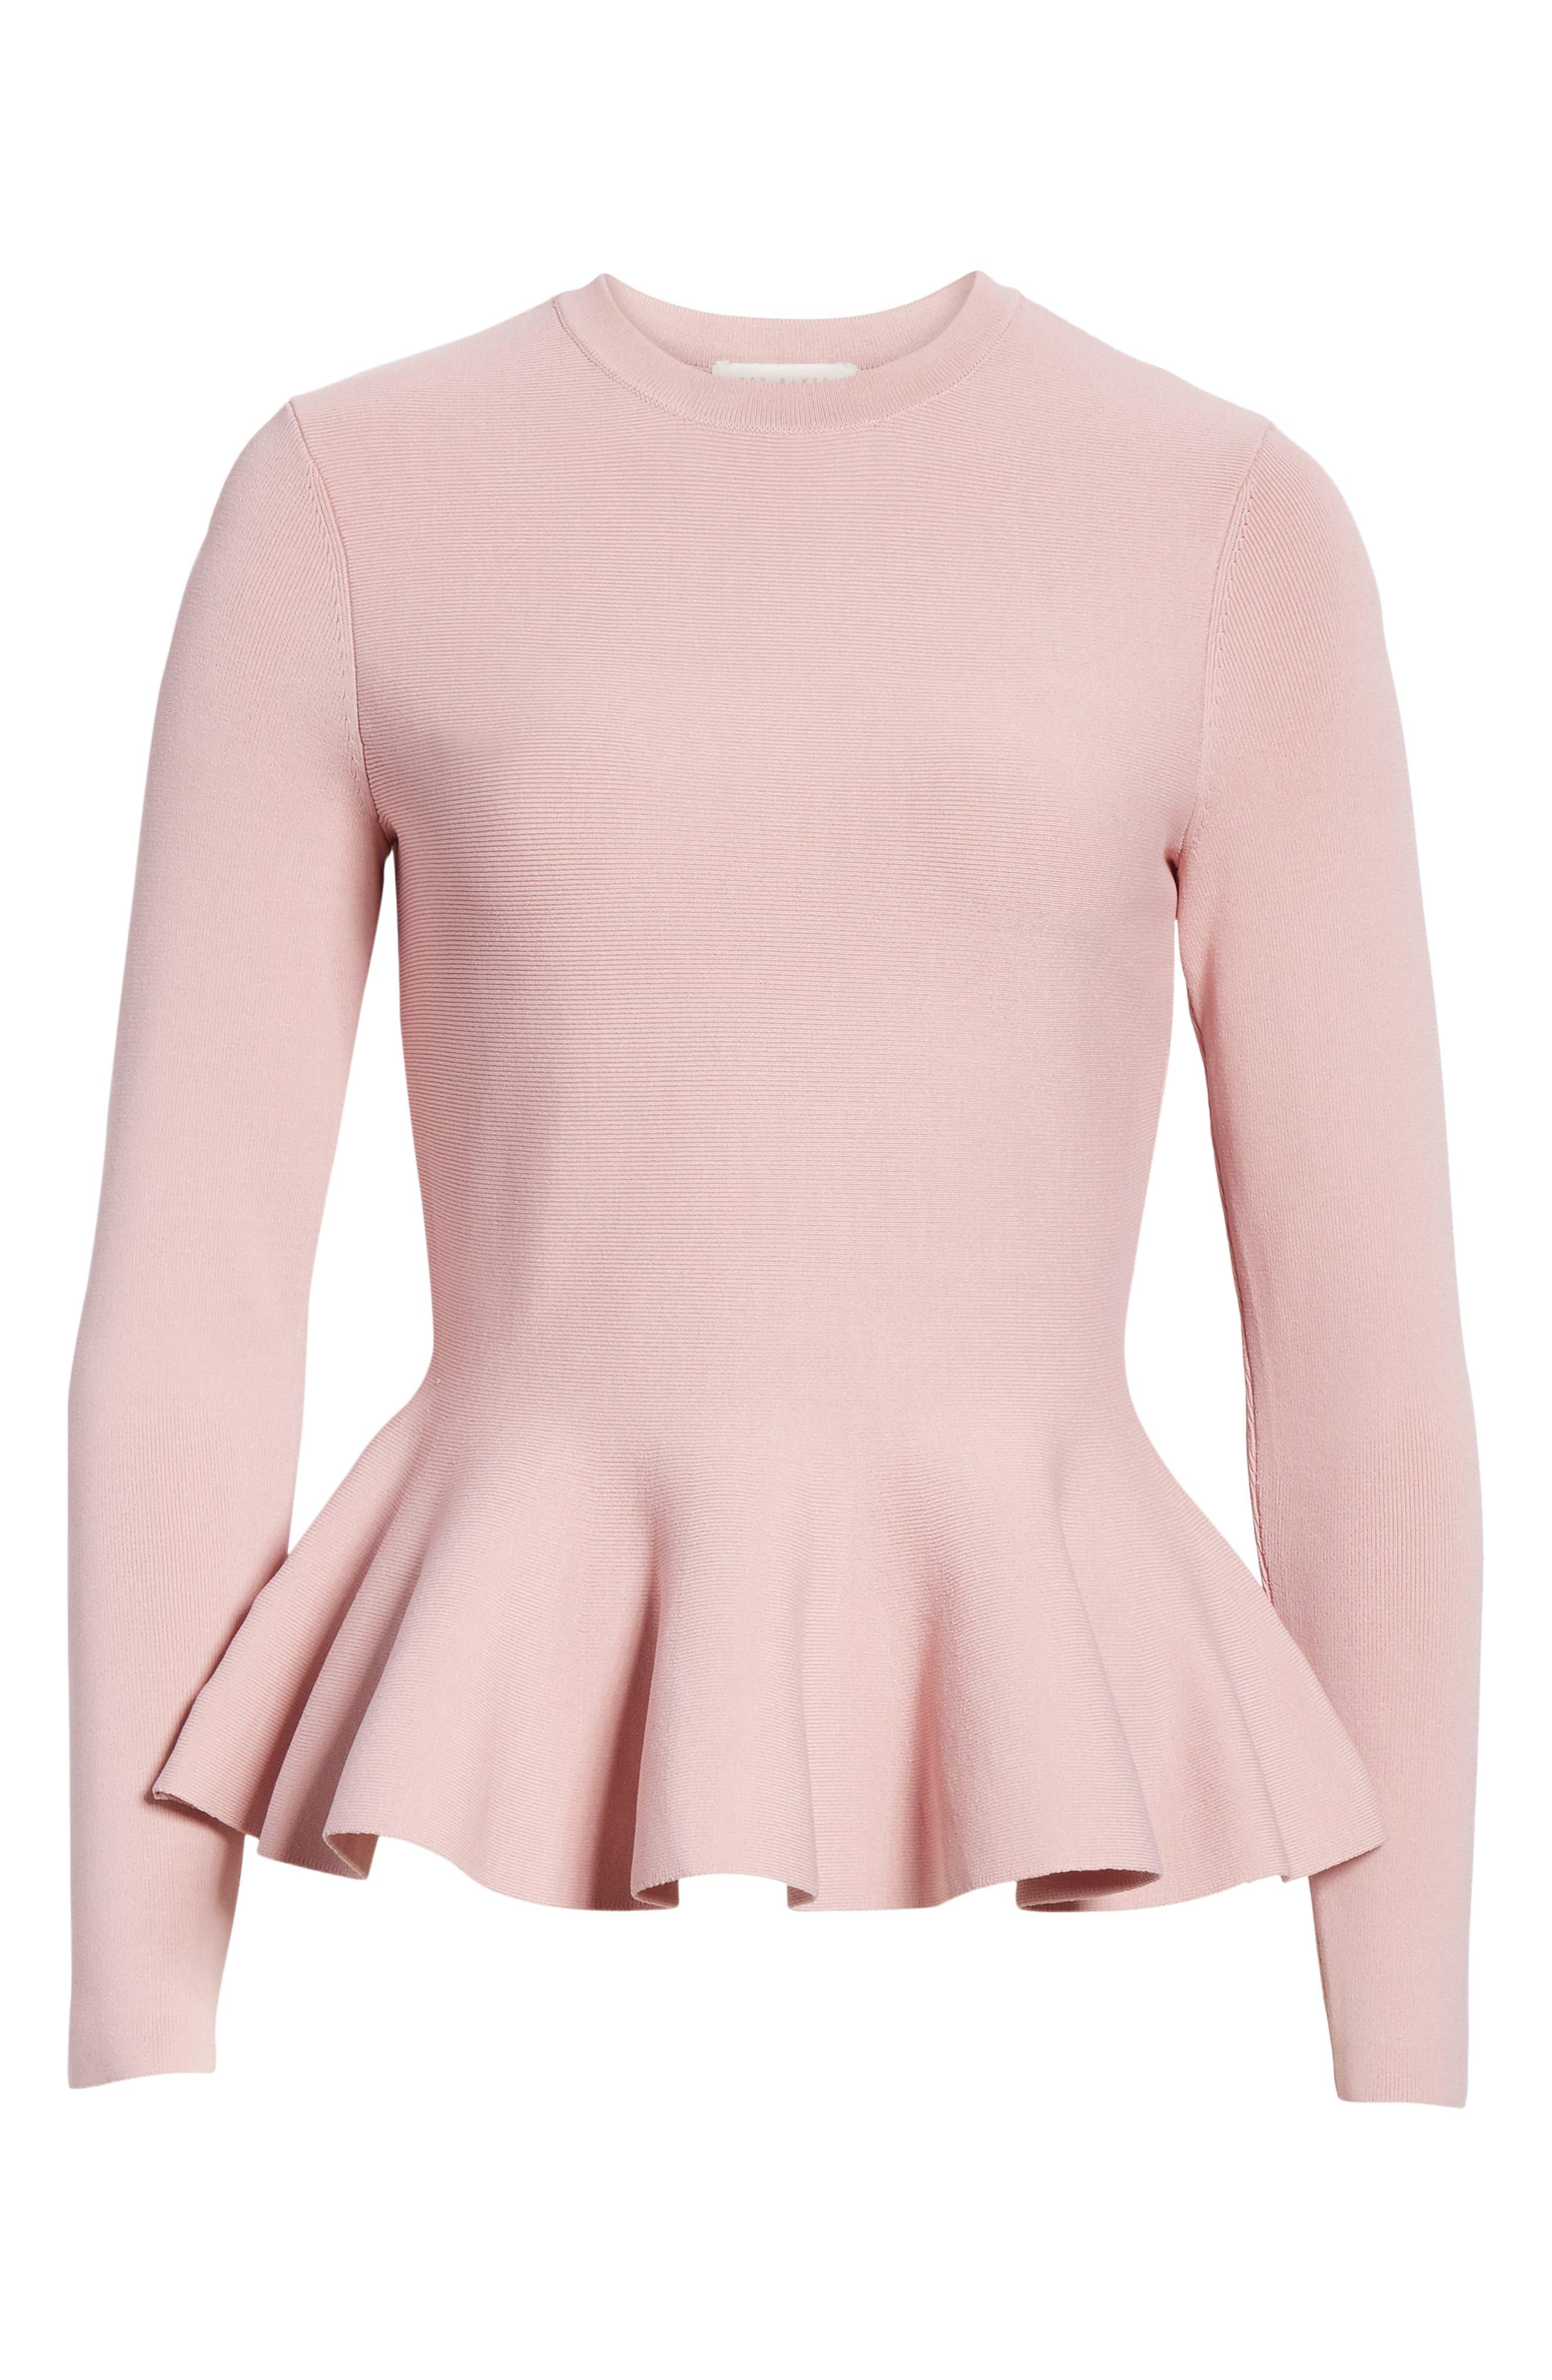 Hinlia Peplum Sweater,                             Alternate thumbnail 6, color,                             DUSKY PINK